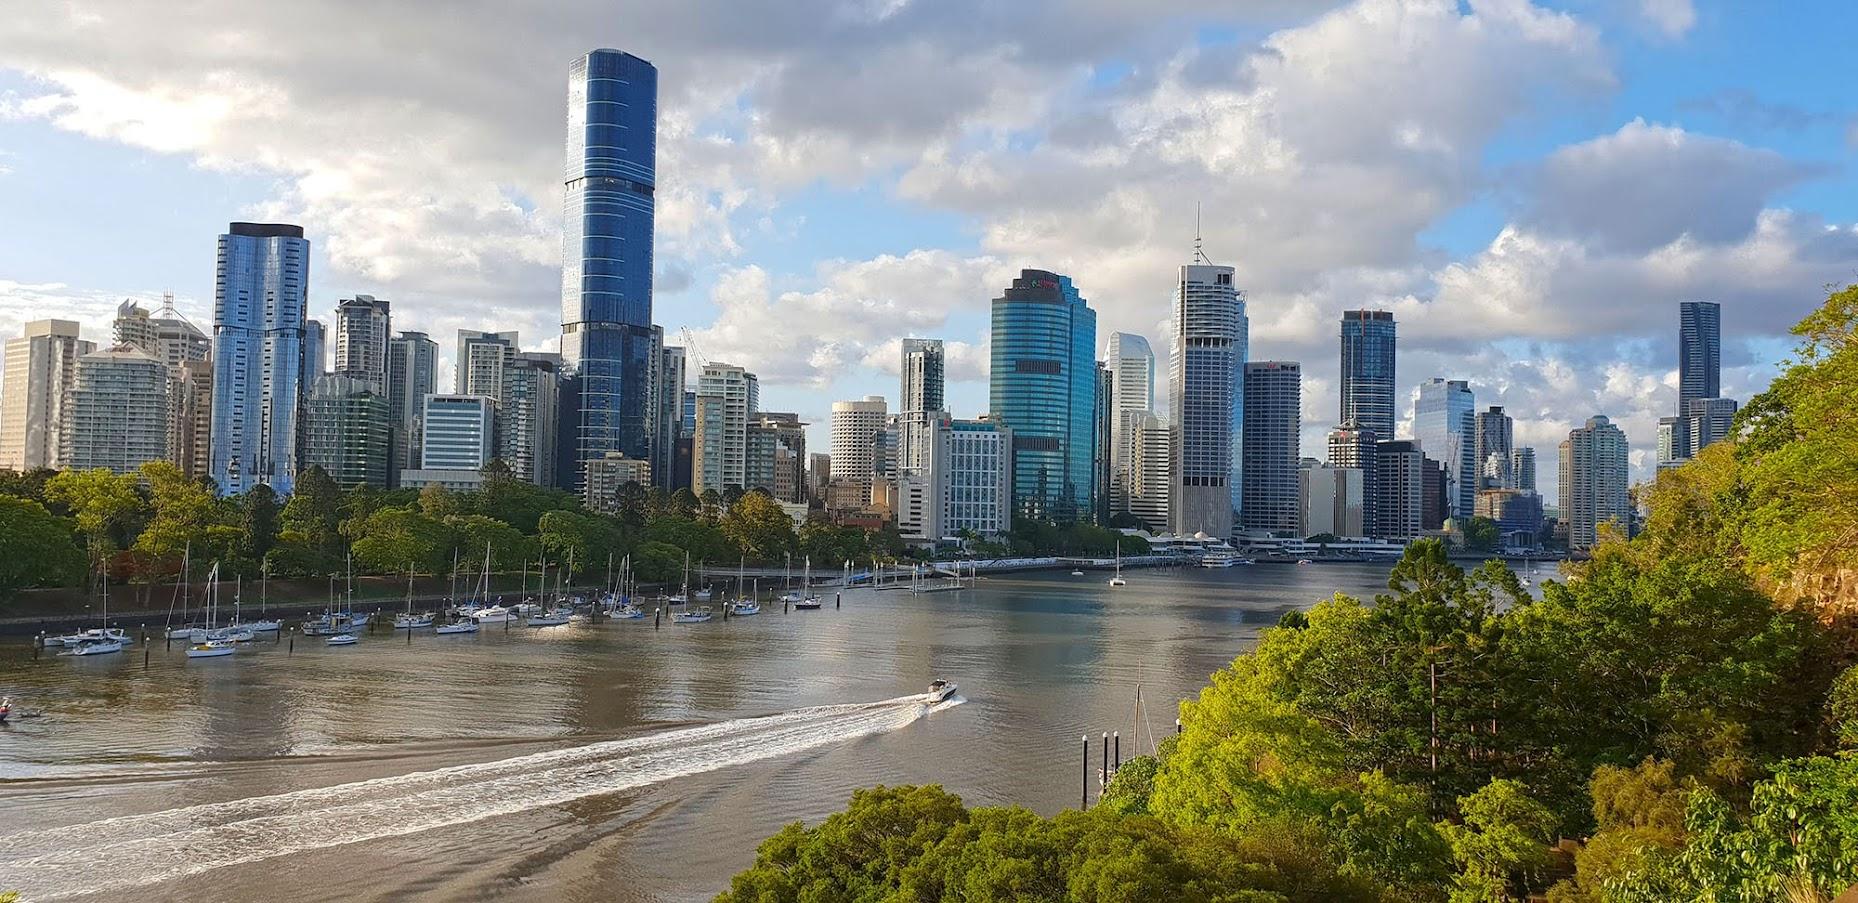 Visitar BRISBANE, a bela capital de Queensland | Austrália